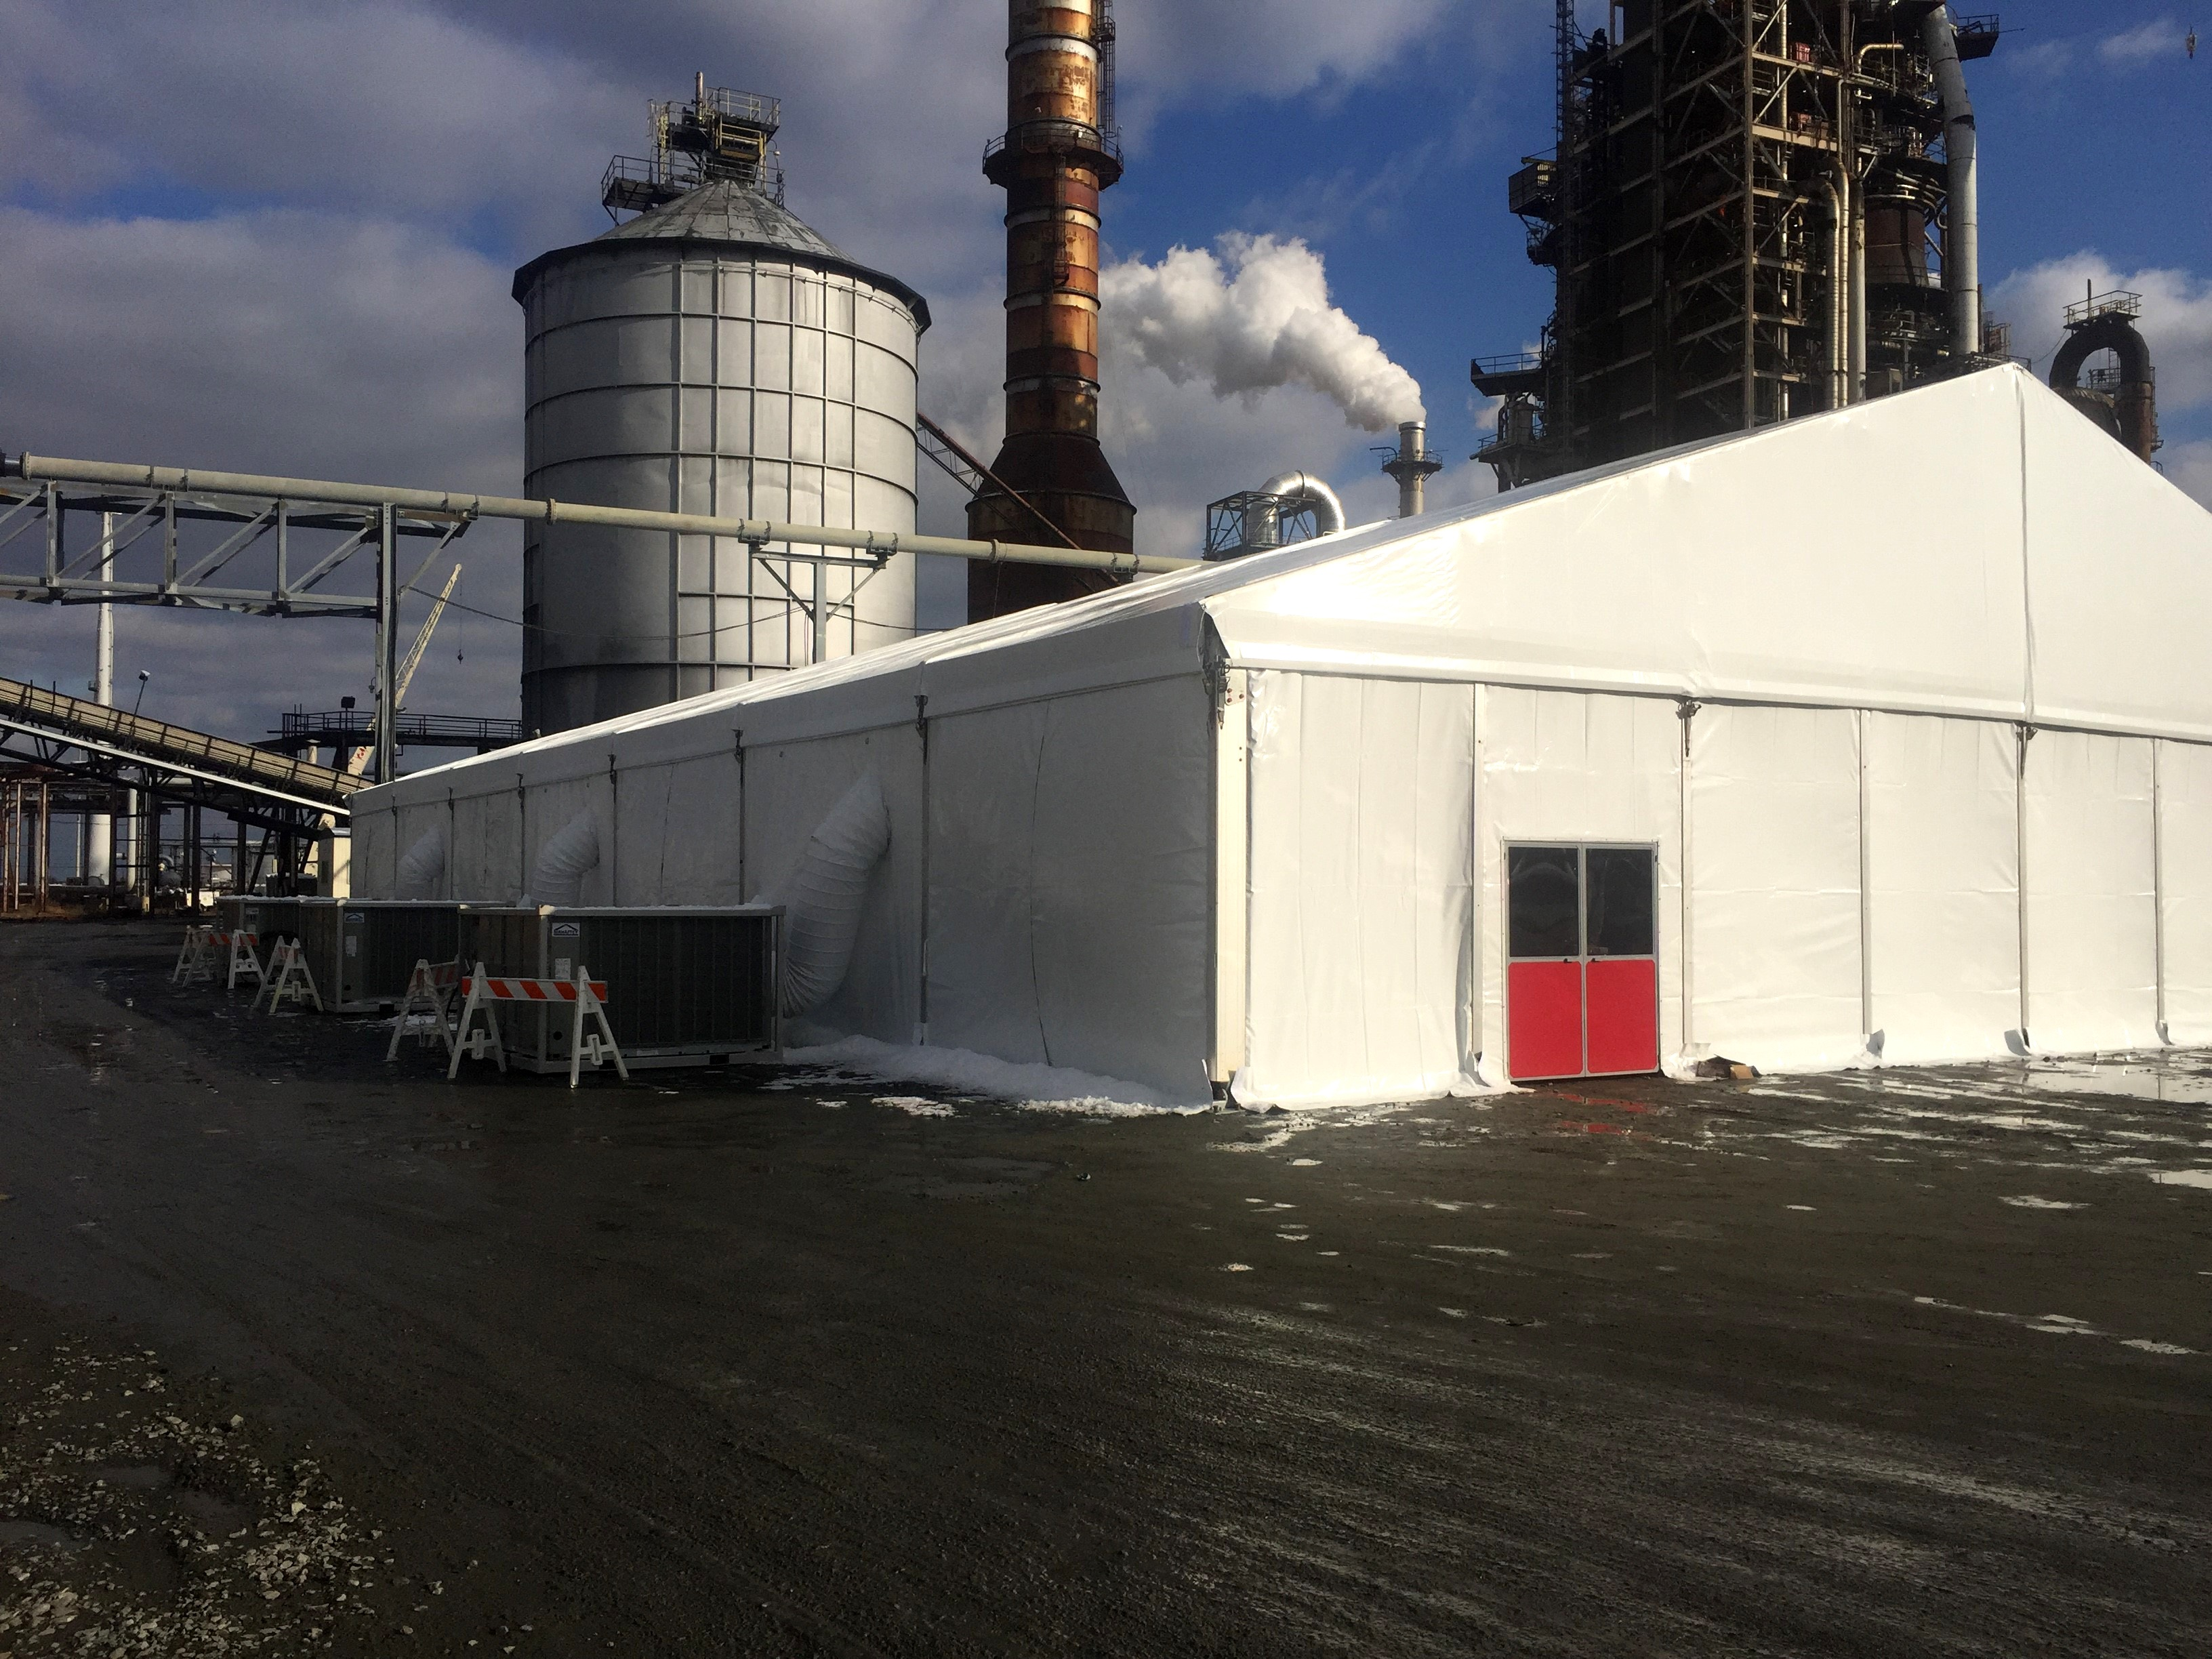 mahaffey-max-industrial-tent.jpg